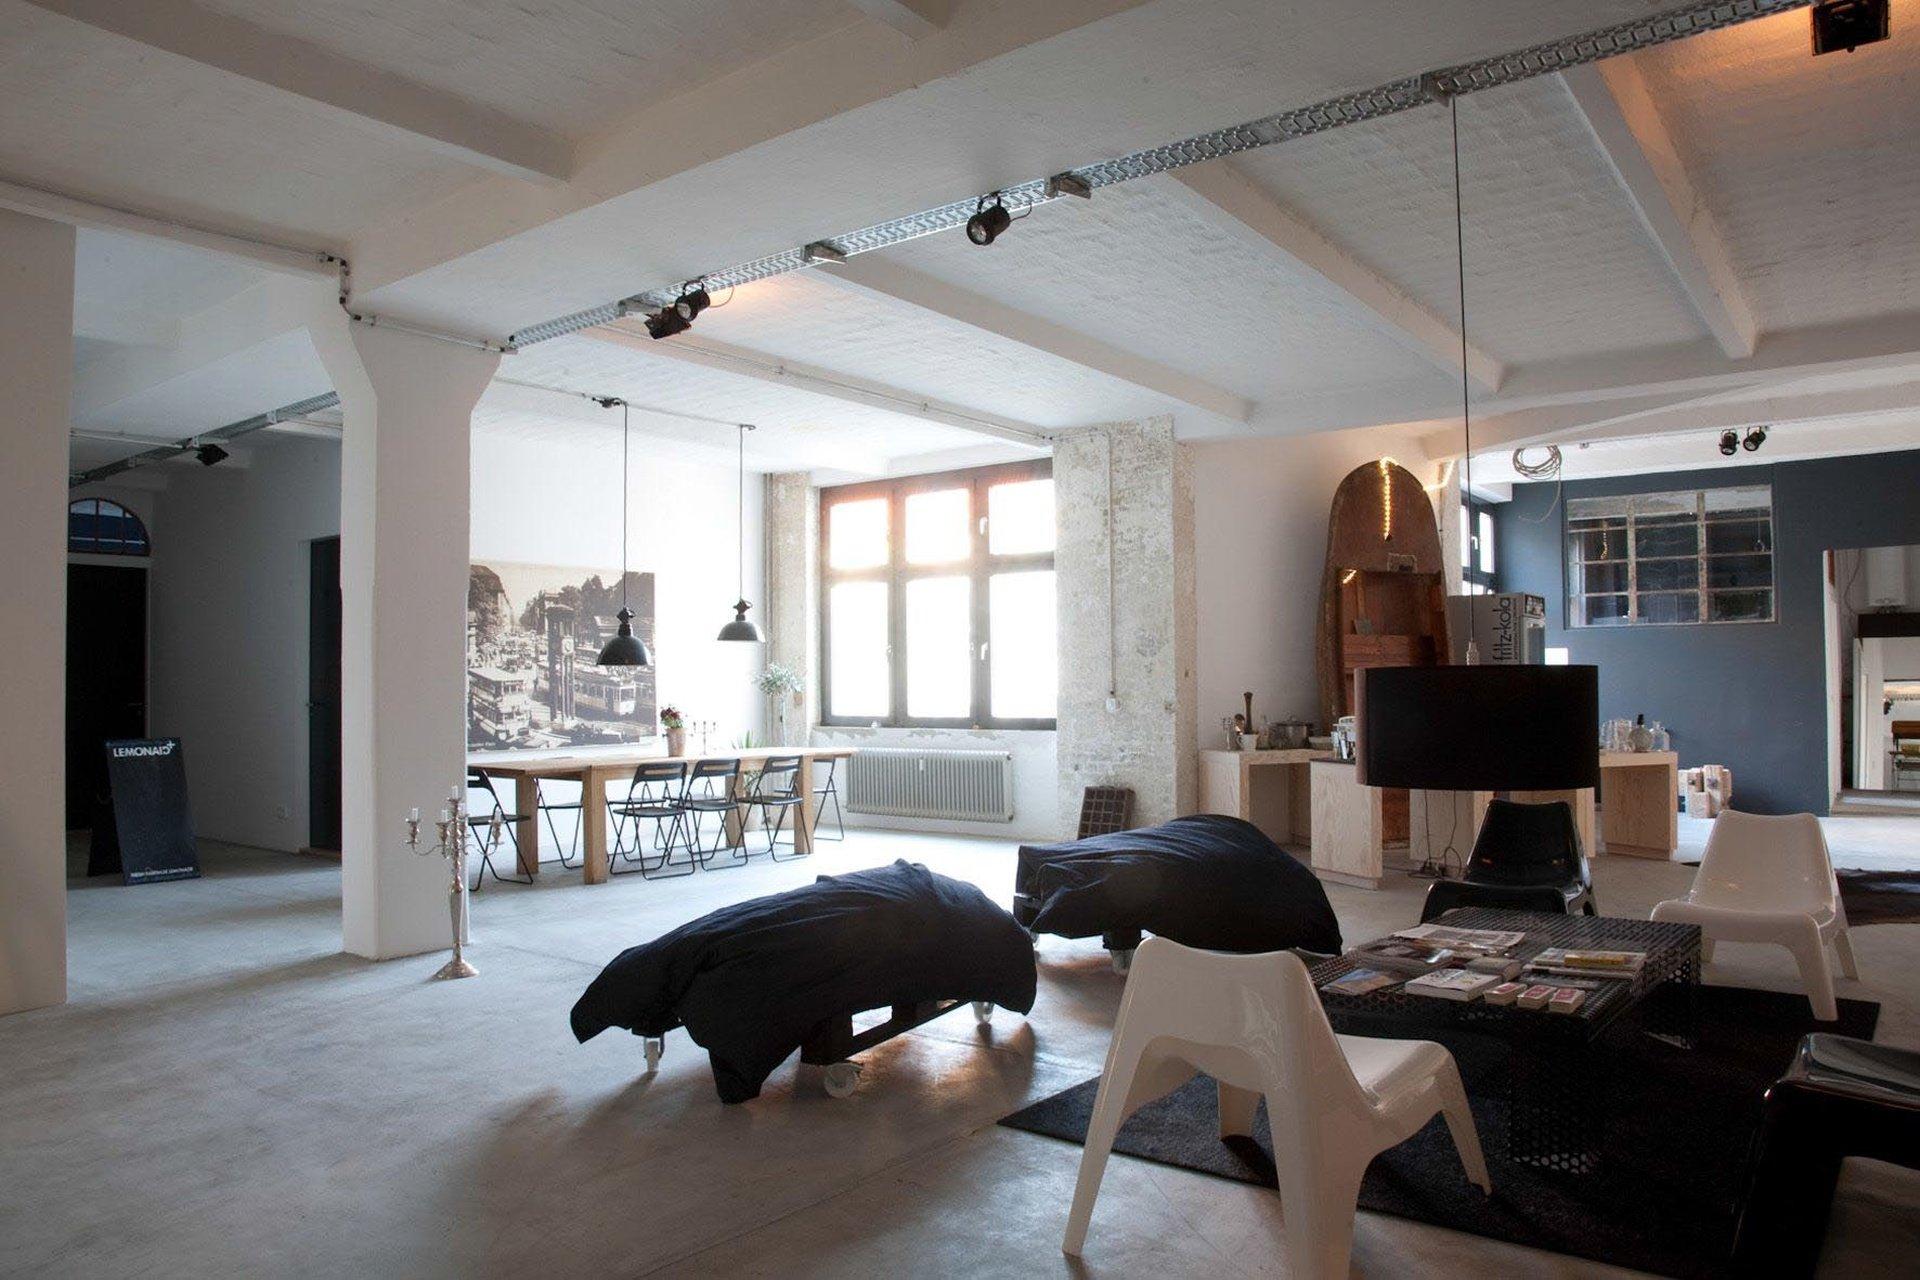 Berlin workshop spaces Loft Storage Berlin Urbanstrasse image 0